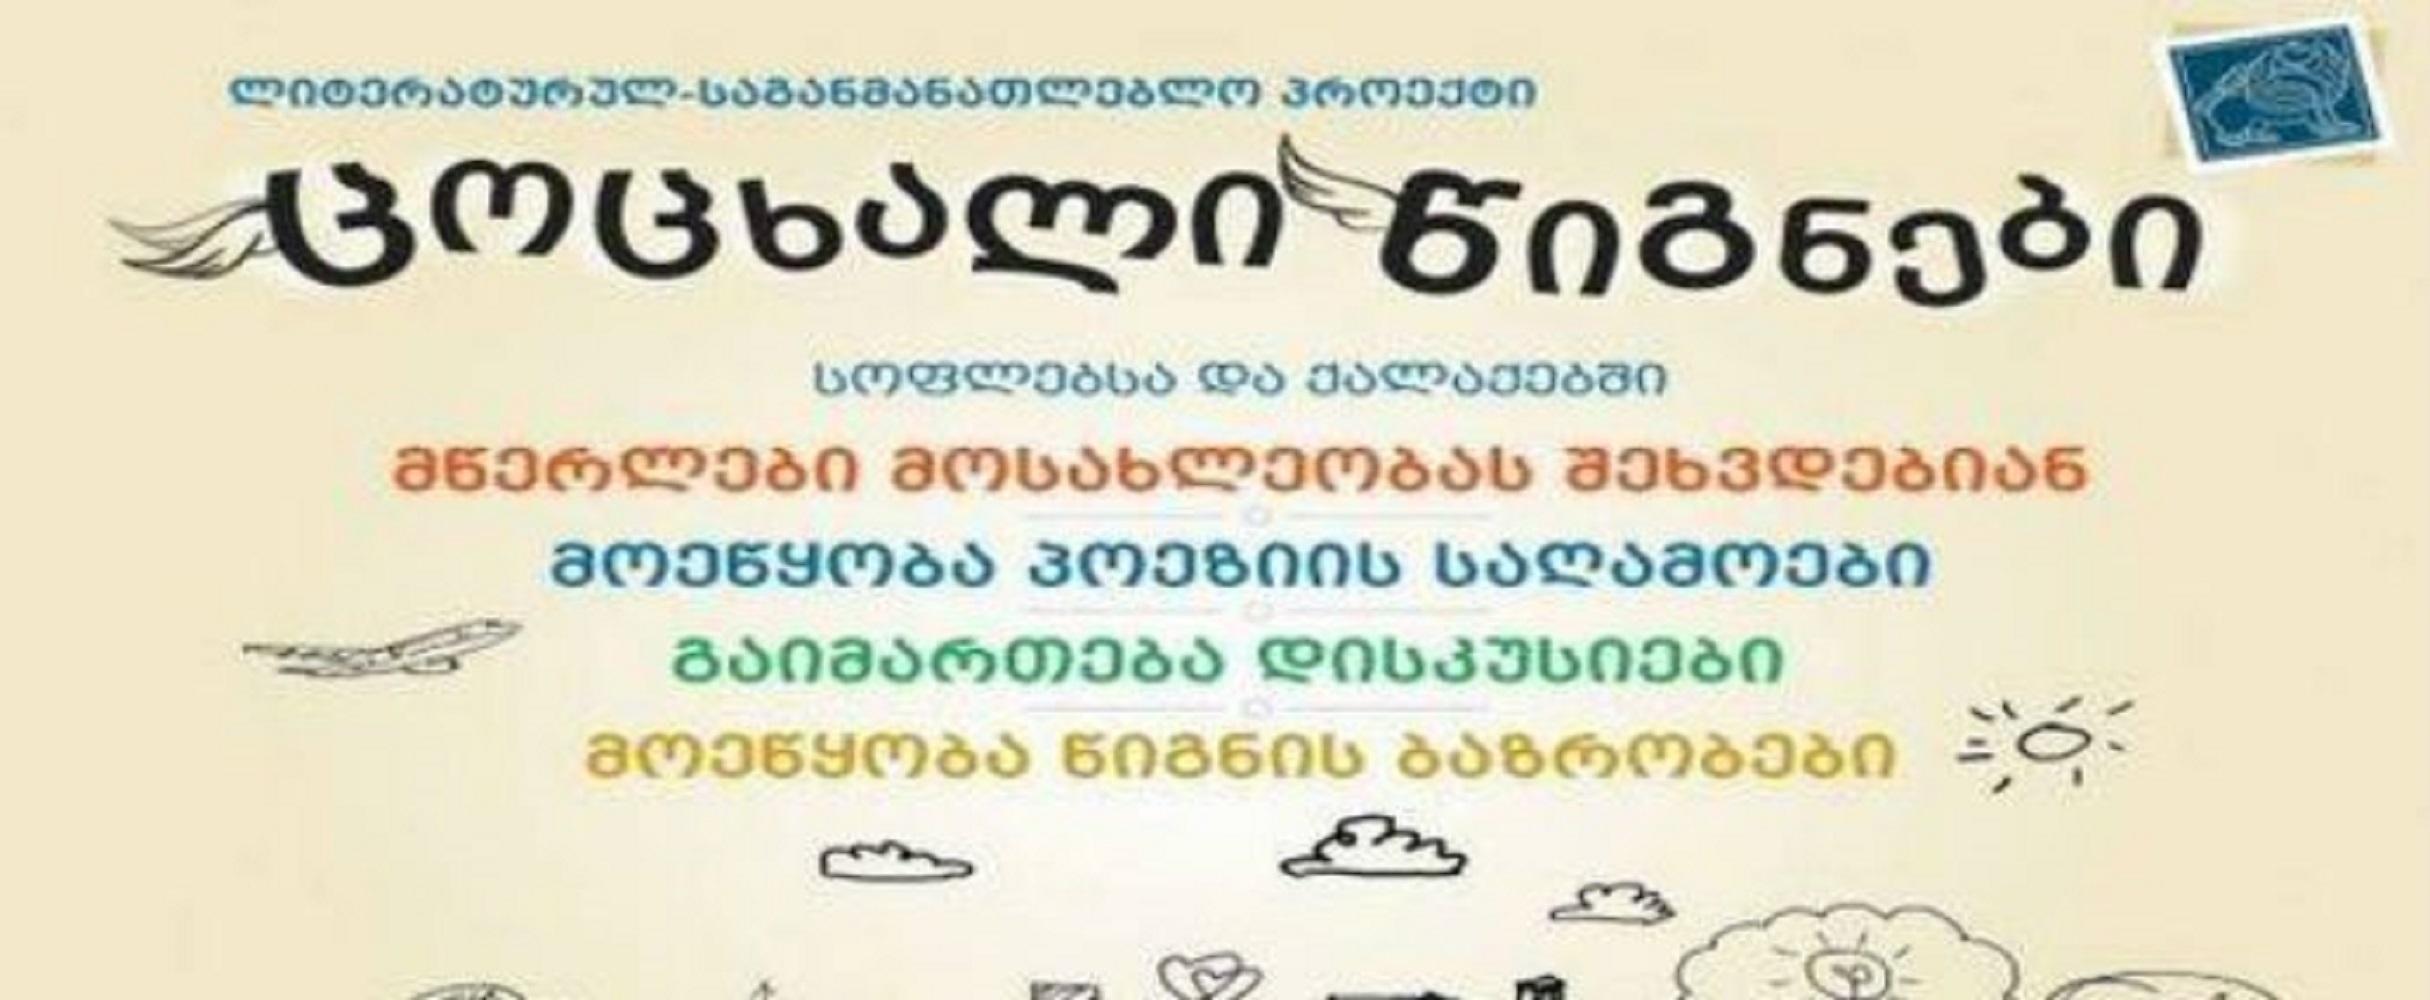 http://new.admin.kharagauli.ge/images/fdghjfcghnjm.jpg